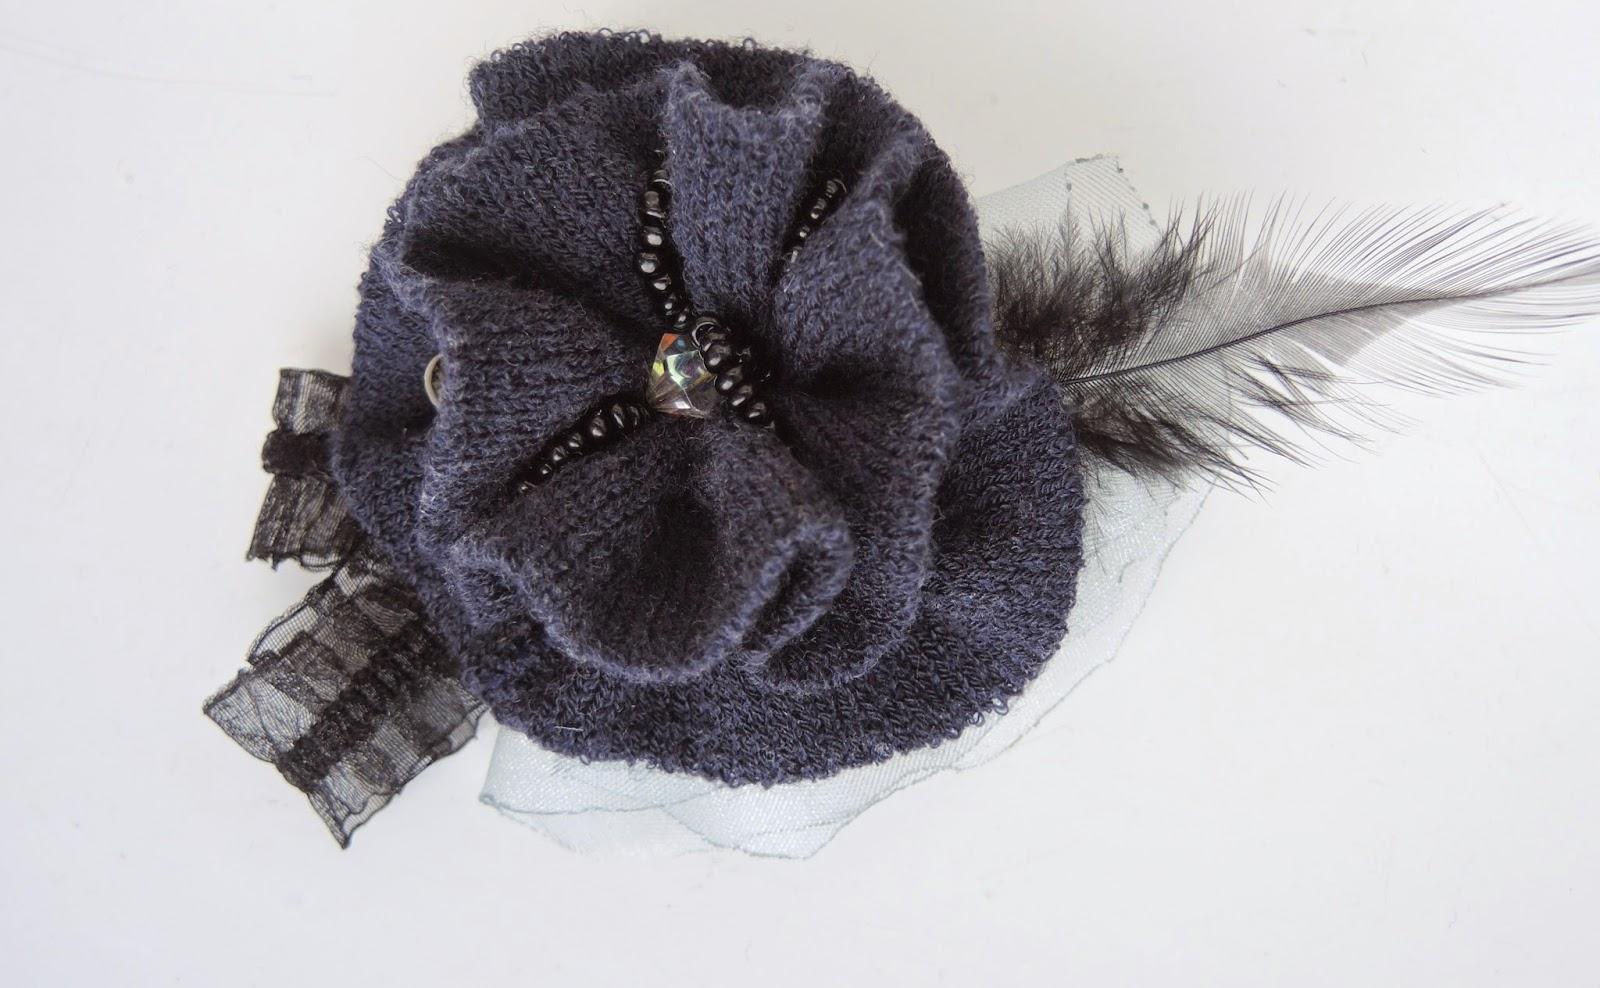 brooch, jewelry, handmade.jpg брошь брошка броши своими руками трикотаж ткань перо бусины украшение из галстука